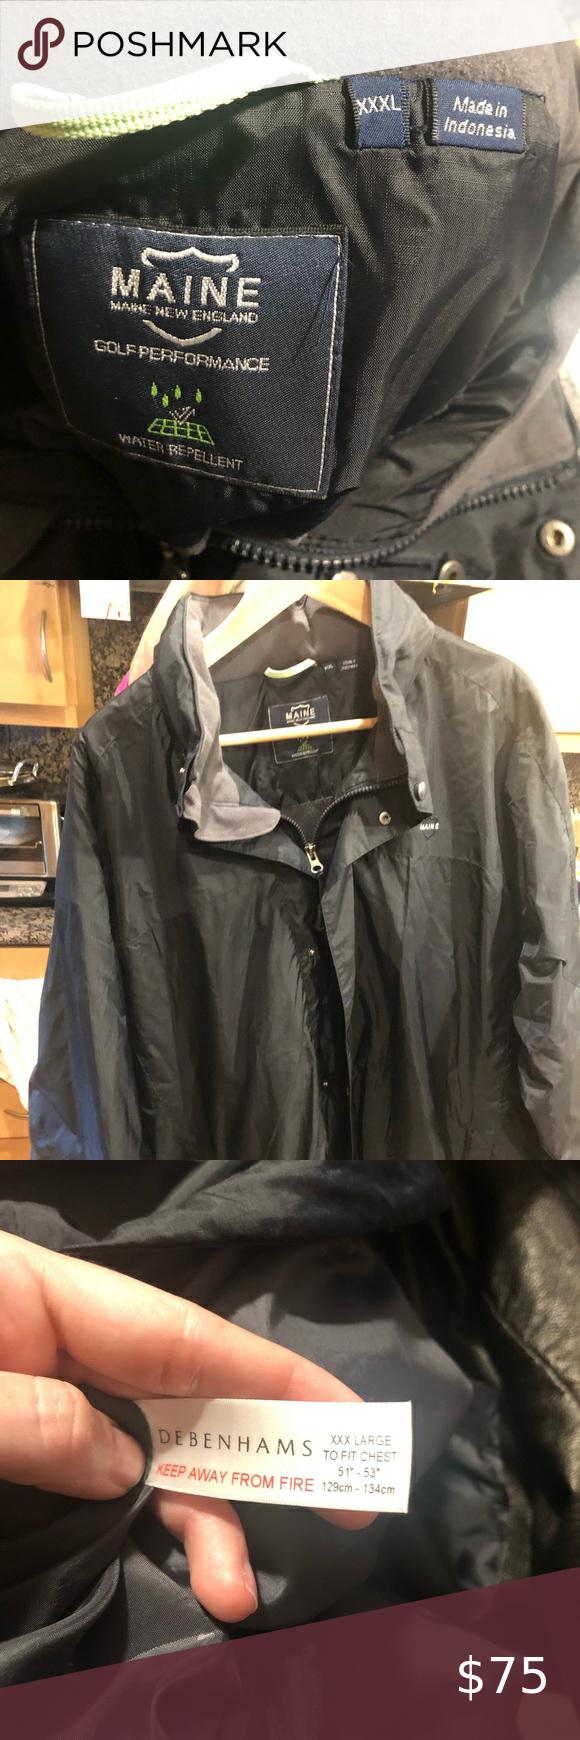 Debenhams Fleece Lined Men S Jacket Xxxl Debenhams Maine New England Golf Performance Men S Fleece Lined Jacket Xxxl O Line Jackets Maine New England Debenhams [ 1740 x 580 Pixel ]